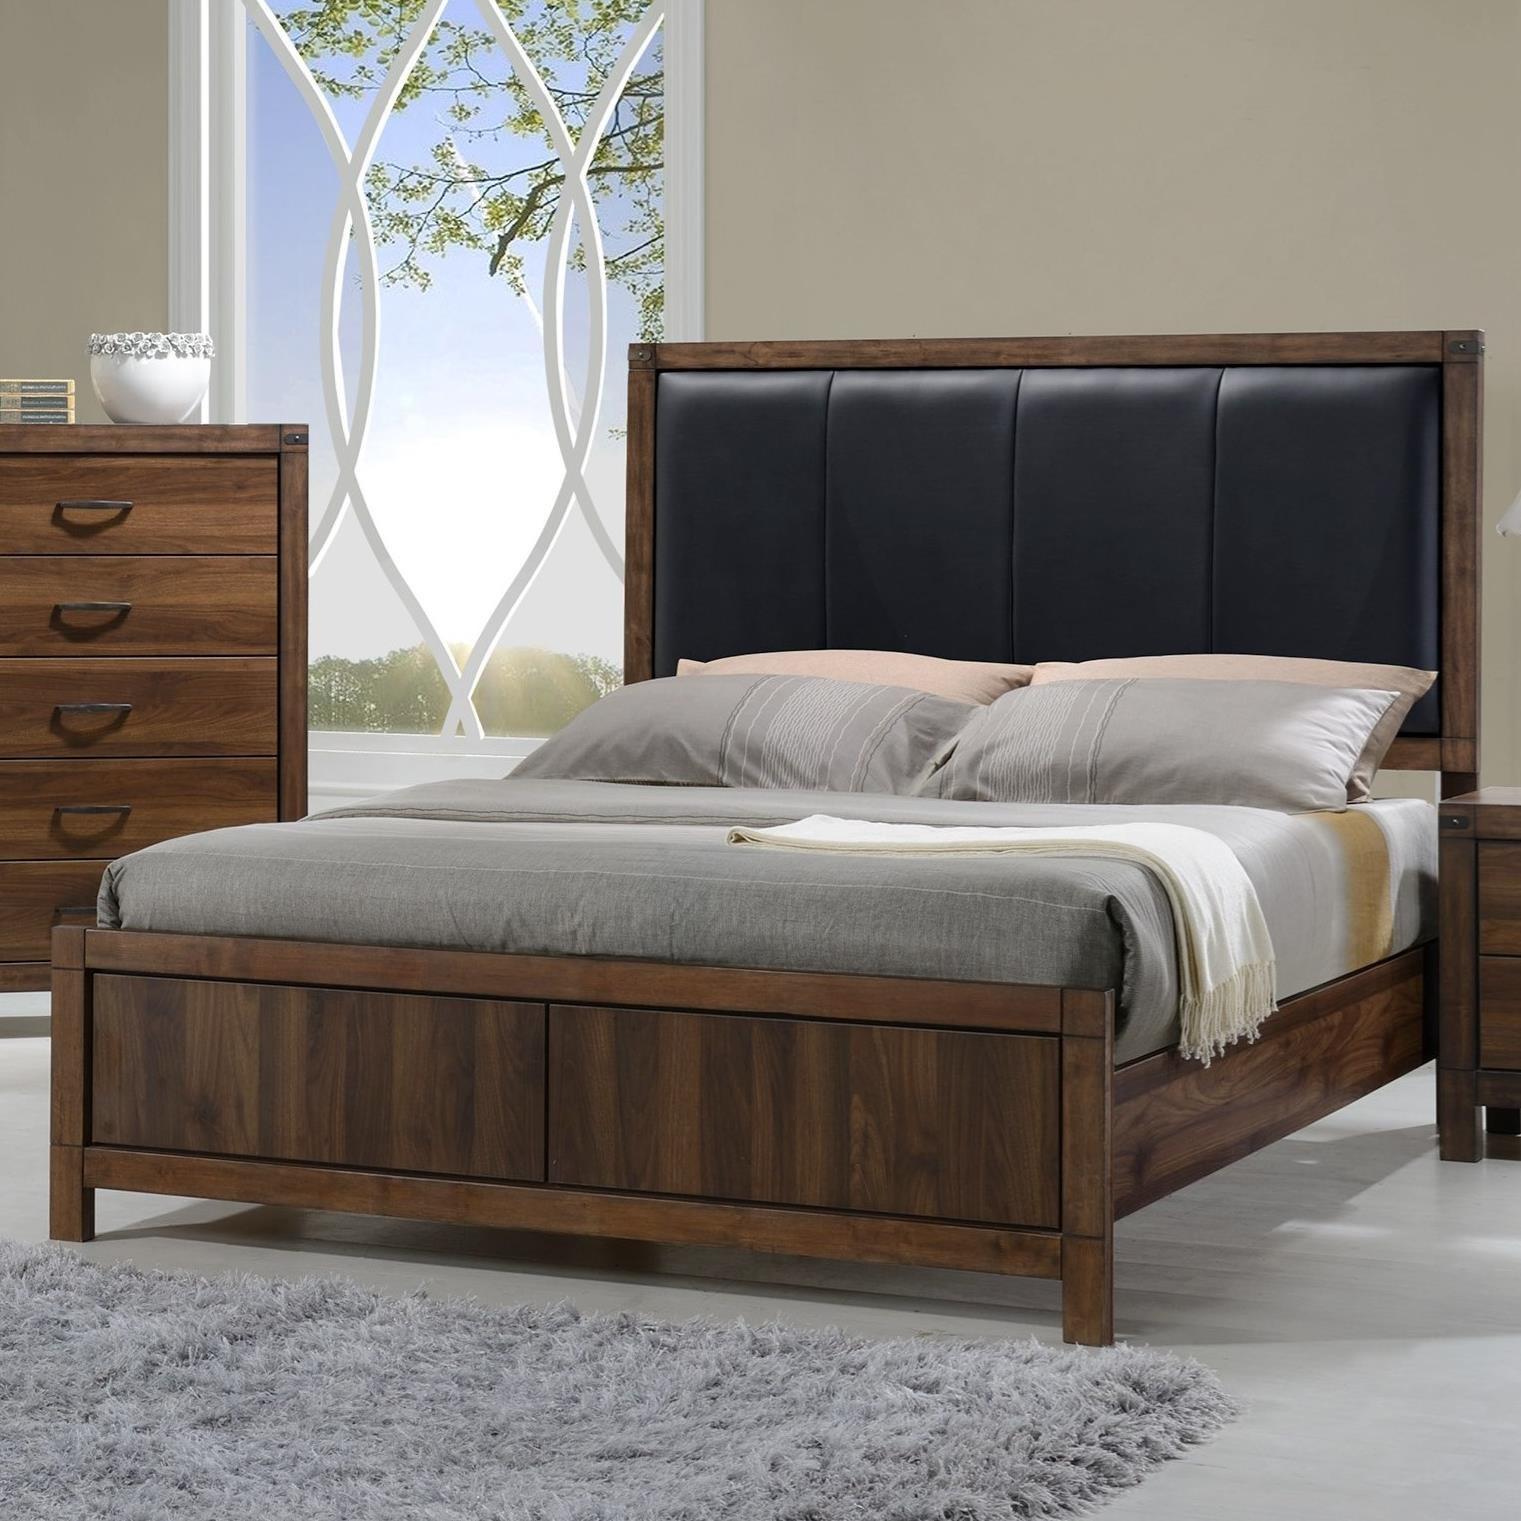 crown mark belmont king bed with upholstered headboard royal furniture headboard footboard. Black Bedroom Furniture Sets. Home Design Ideas